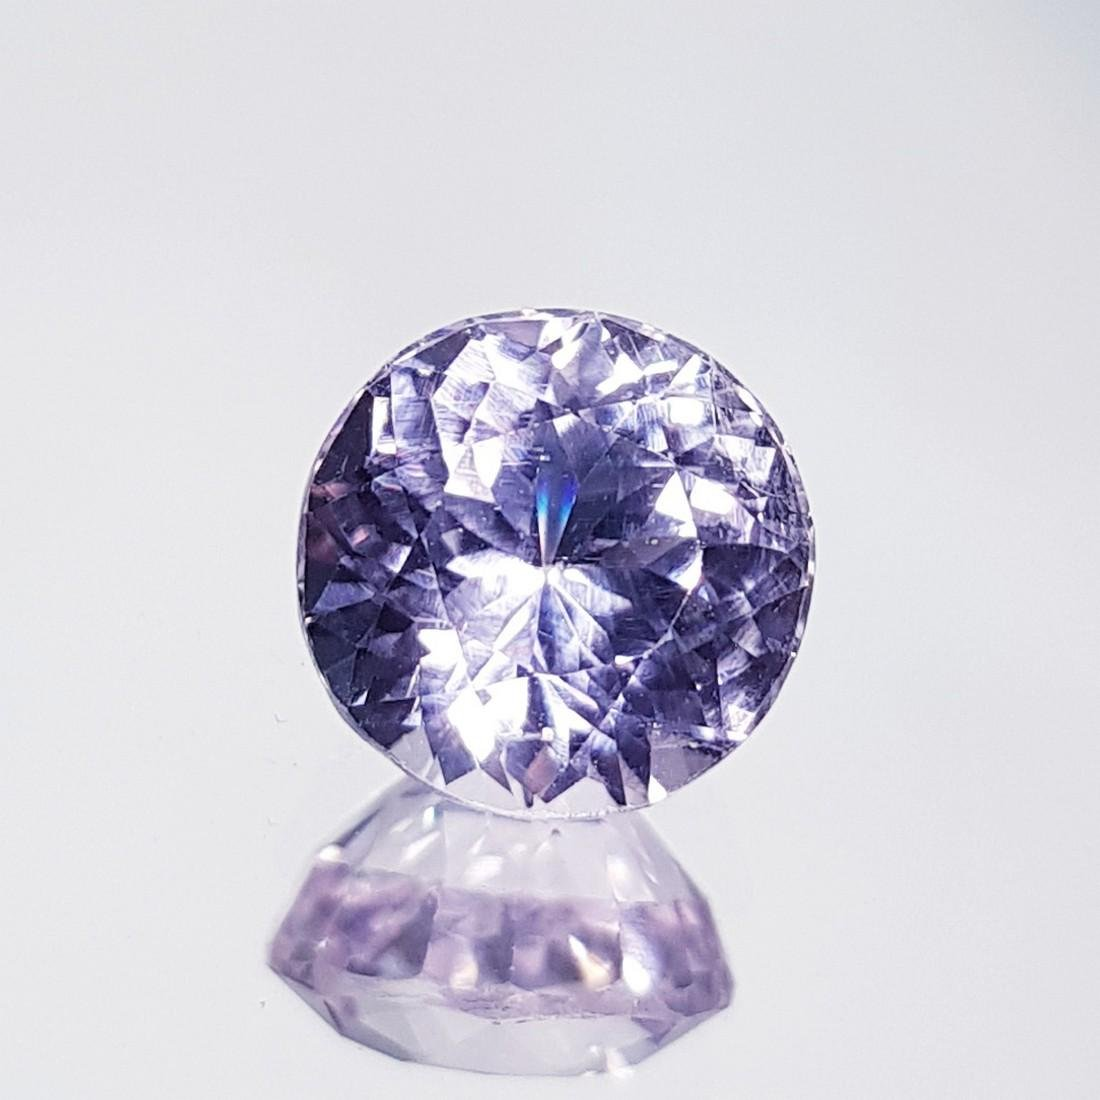 Natural  Kunzite - 5.15 ct